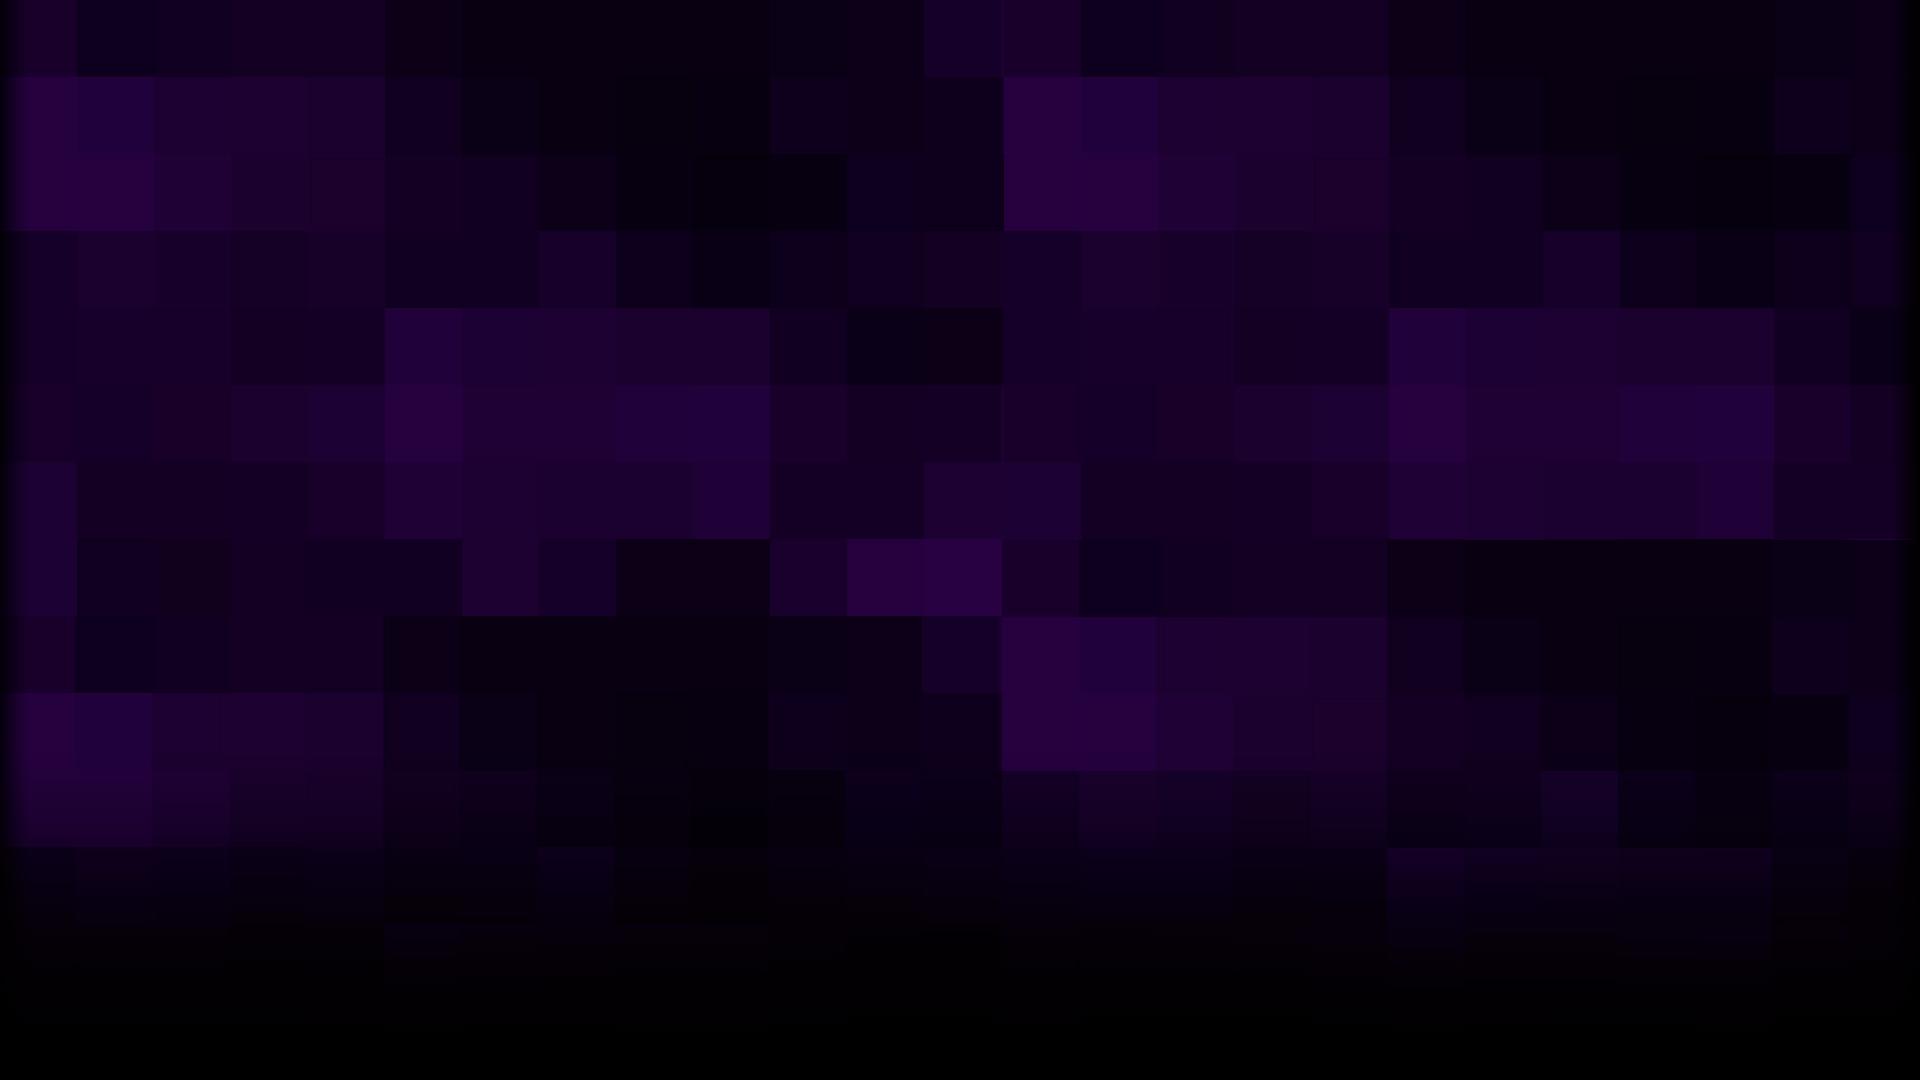 group of purple haze background